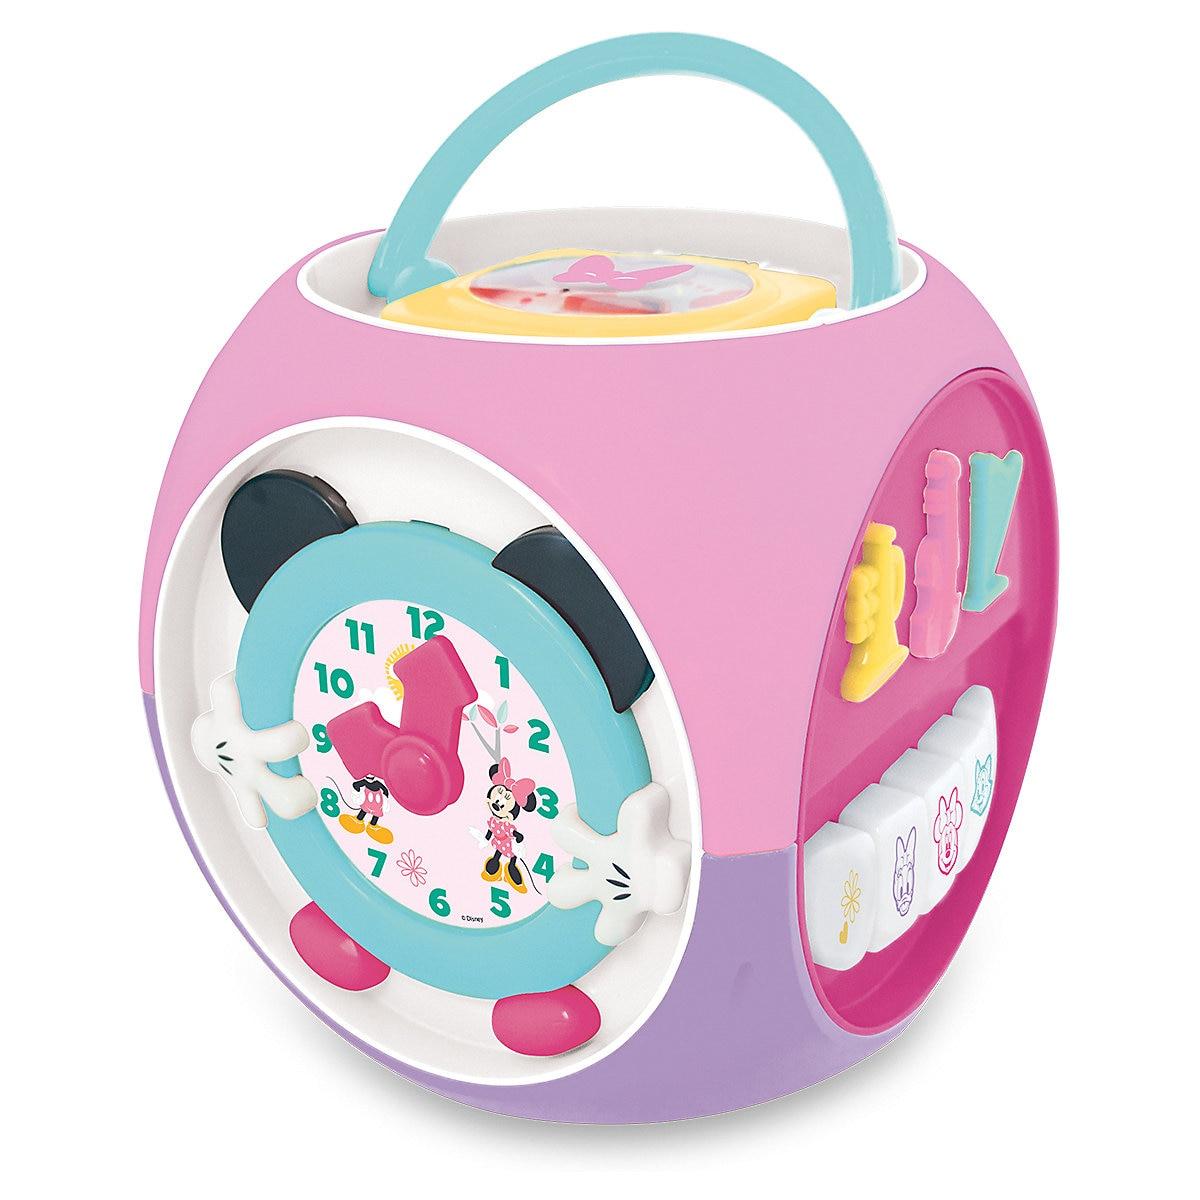 KIDDIELAND bébé hochets & Mobiles 9508077 bizybord jouet jeux MTpromo